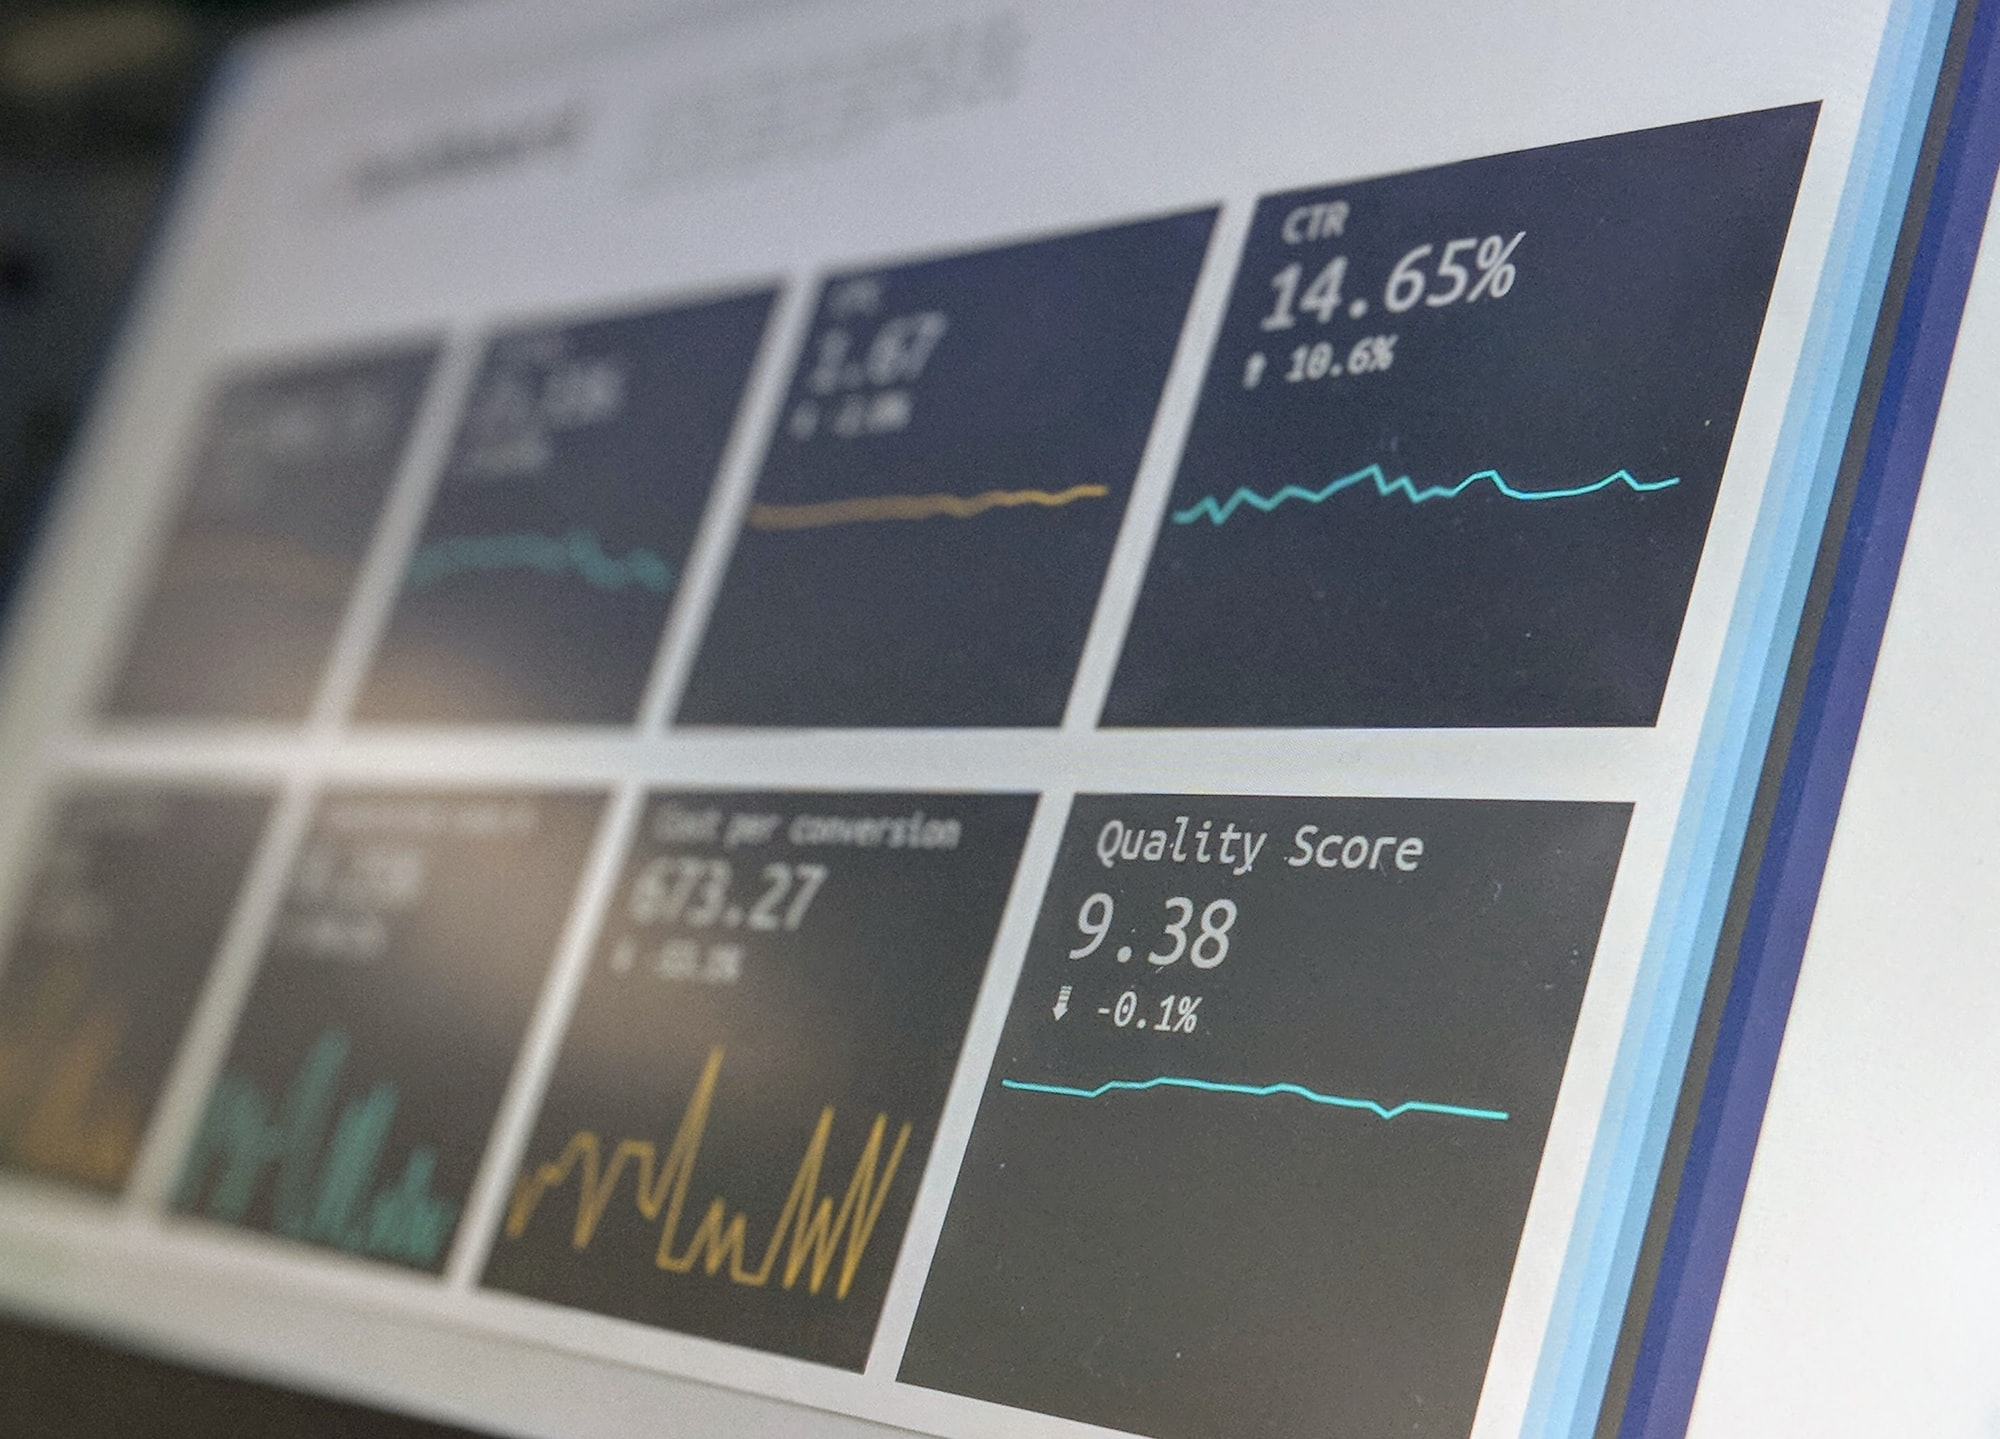 Automating ETL jobs on time series data with QuestDB on Google Cloud Platform